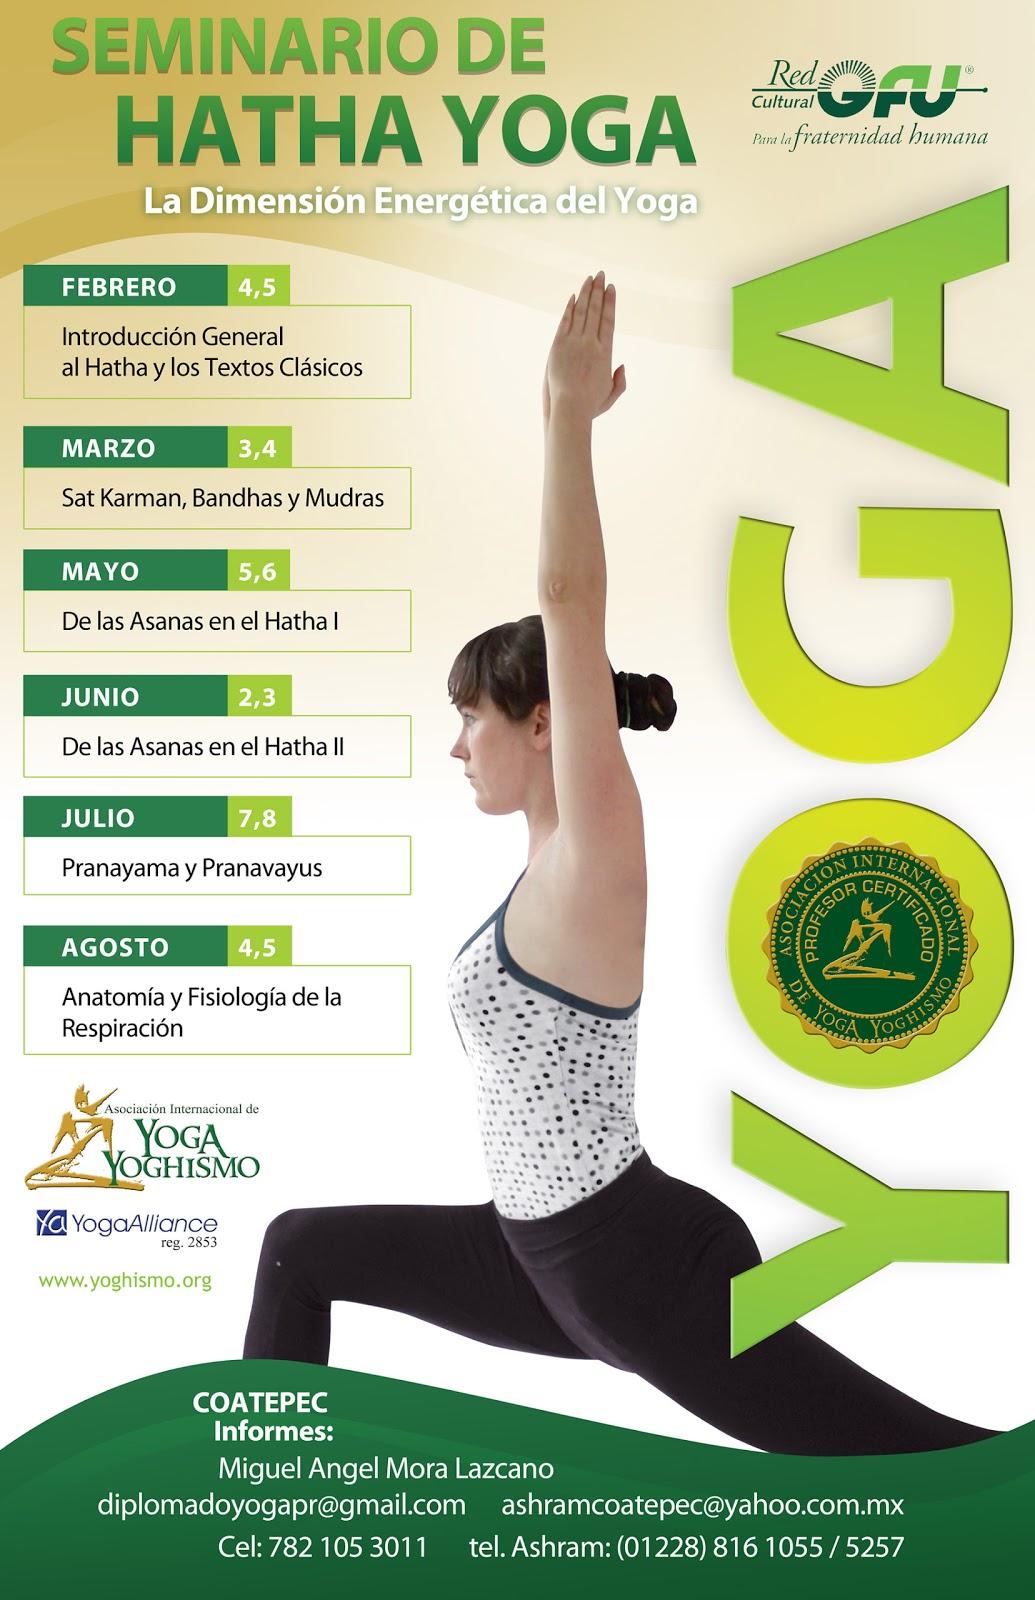 Noticias RedGFU: Seminario de hatha yoga en Coatepec, México